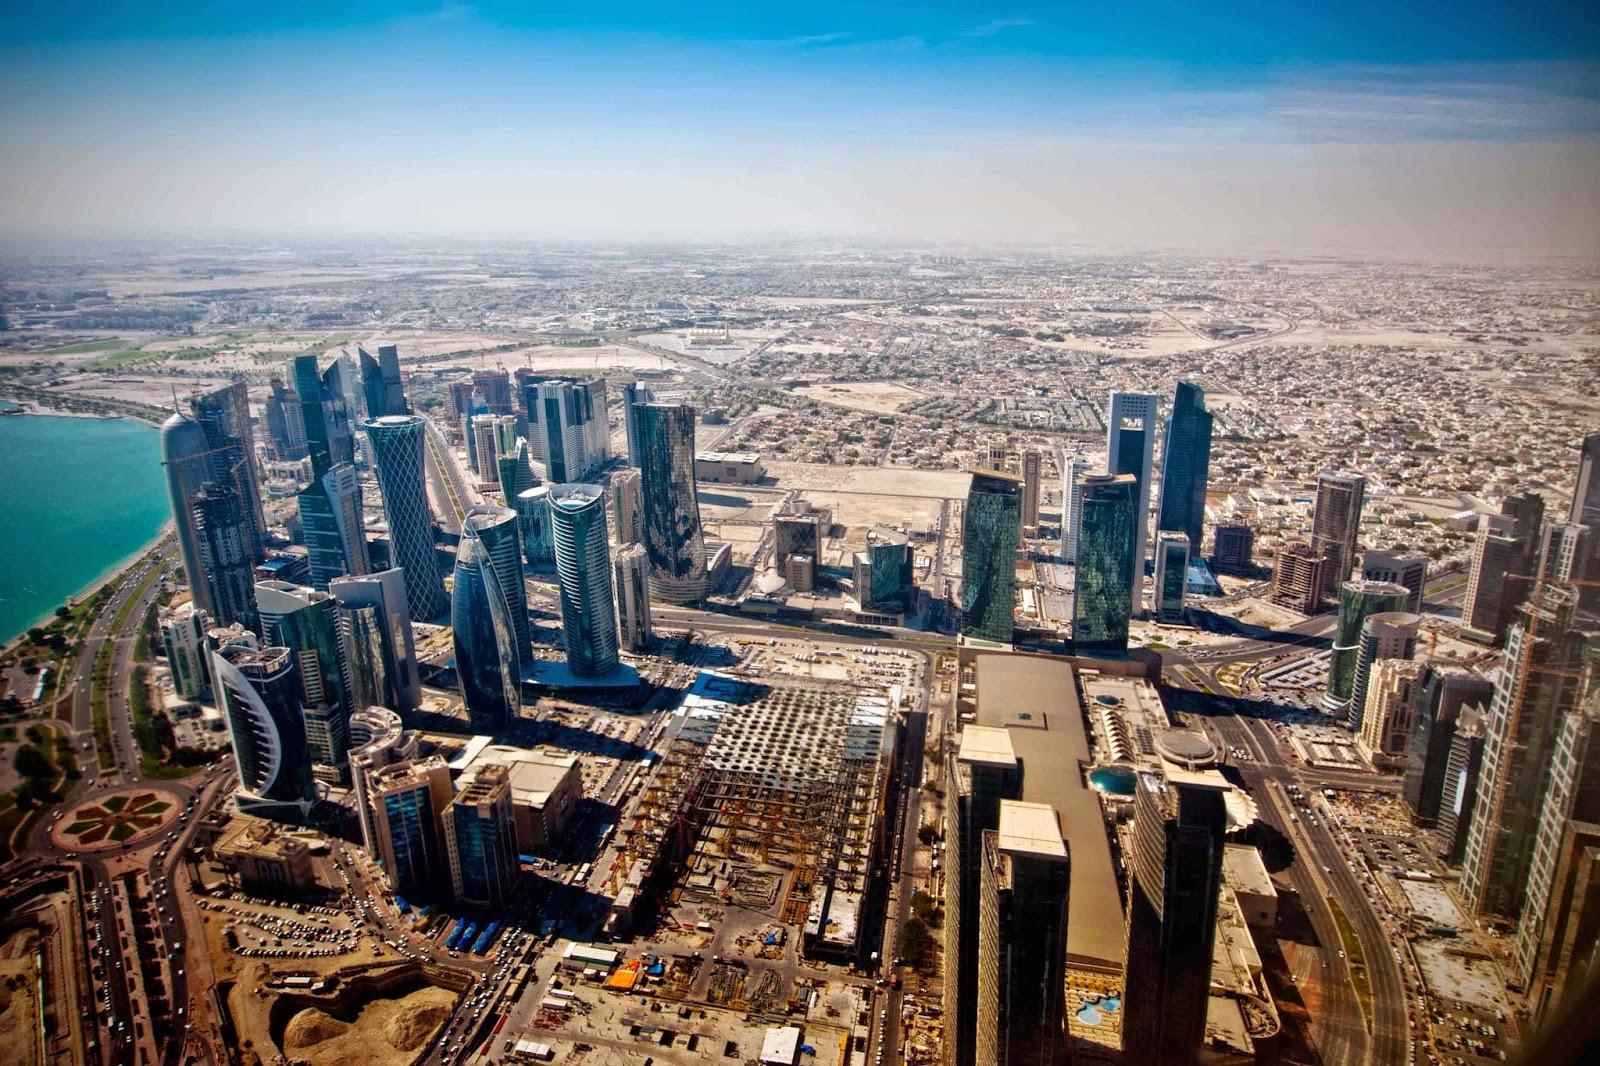 "<img src=""http://4.bp.blogspot.com/-vPOepdRMHz0/U5ibWNxz-WI/AAAAAAAAAOI/PQpkYJcmc_k/s1600/qatar.jpg"" alt=""Richest Countries in the World"" />"